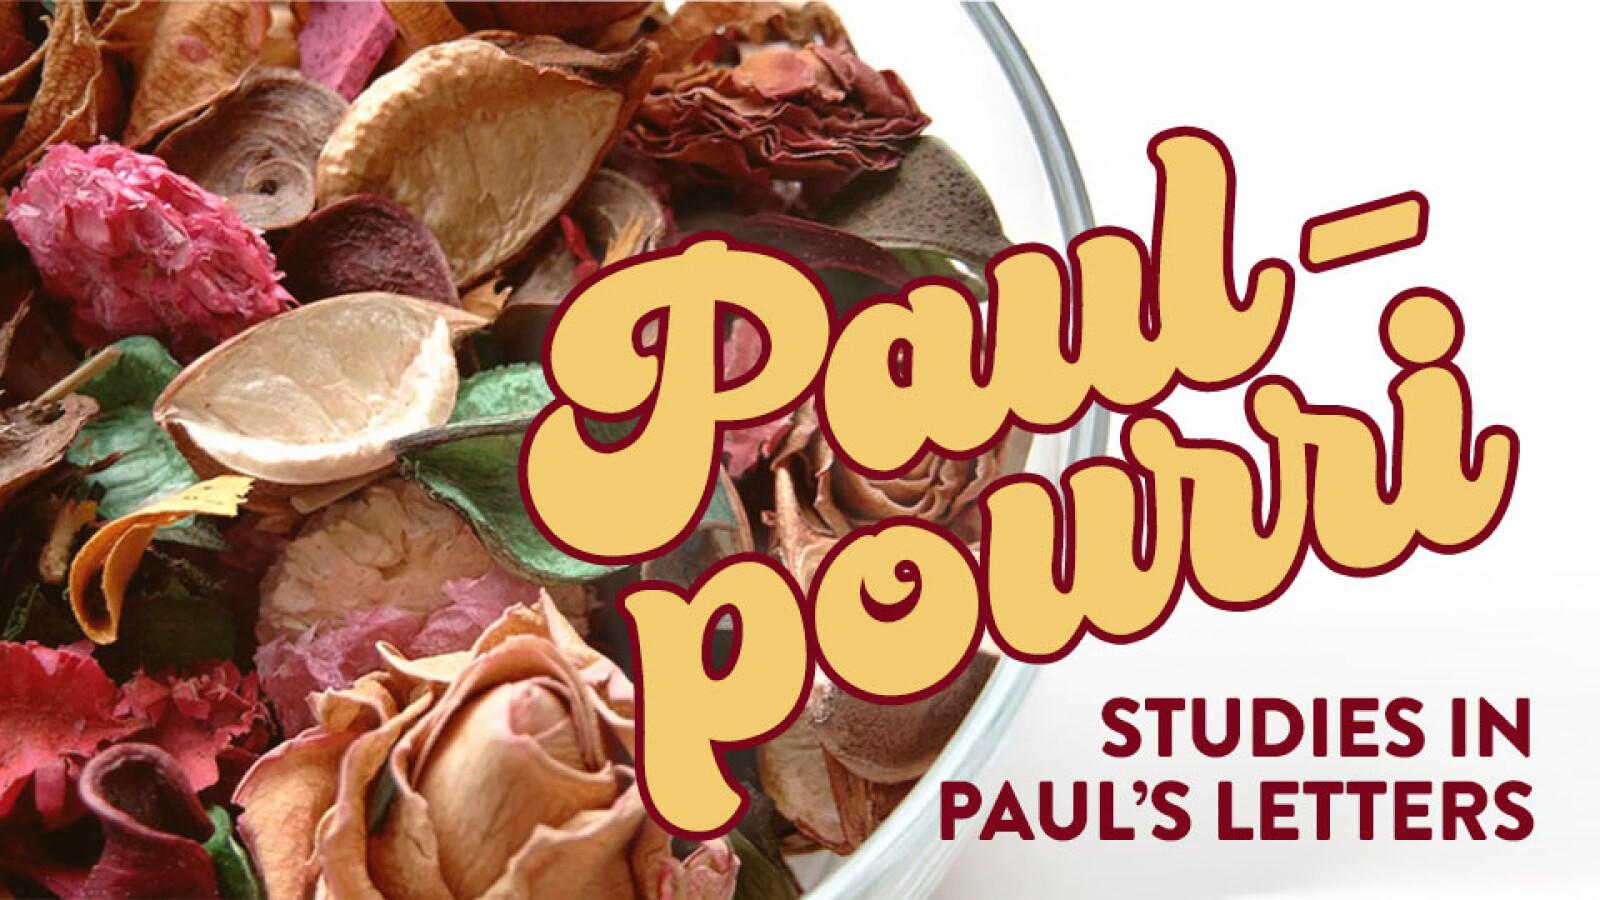 Paul-pourri: Studies in Paul's Letters